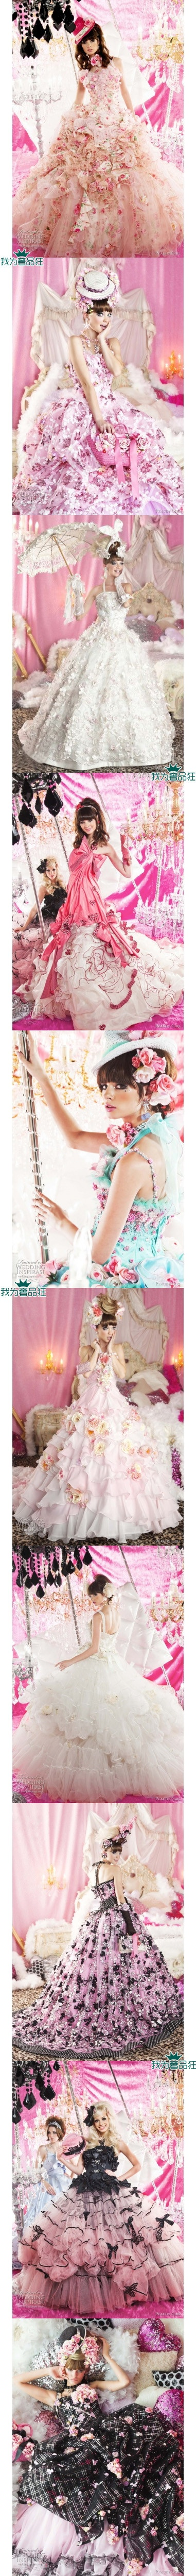 55 best Style images on Pinterest | Bridal dresses, Wedding dress ...